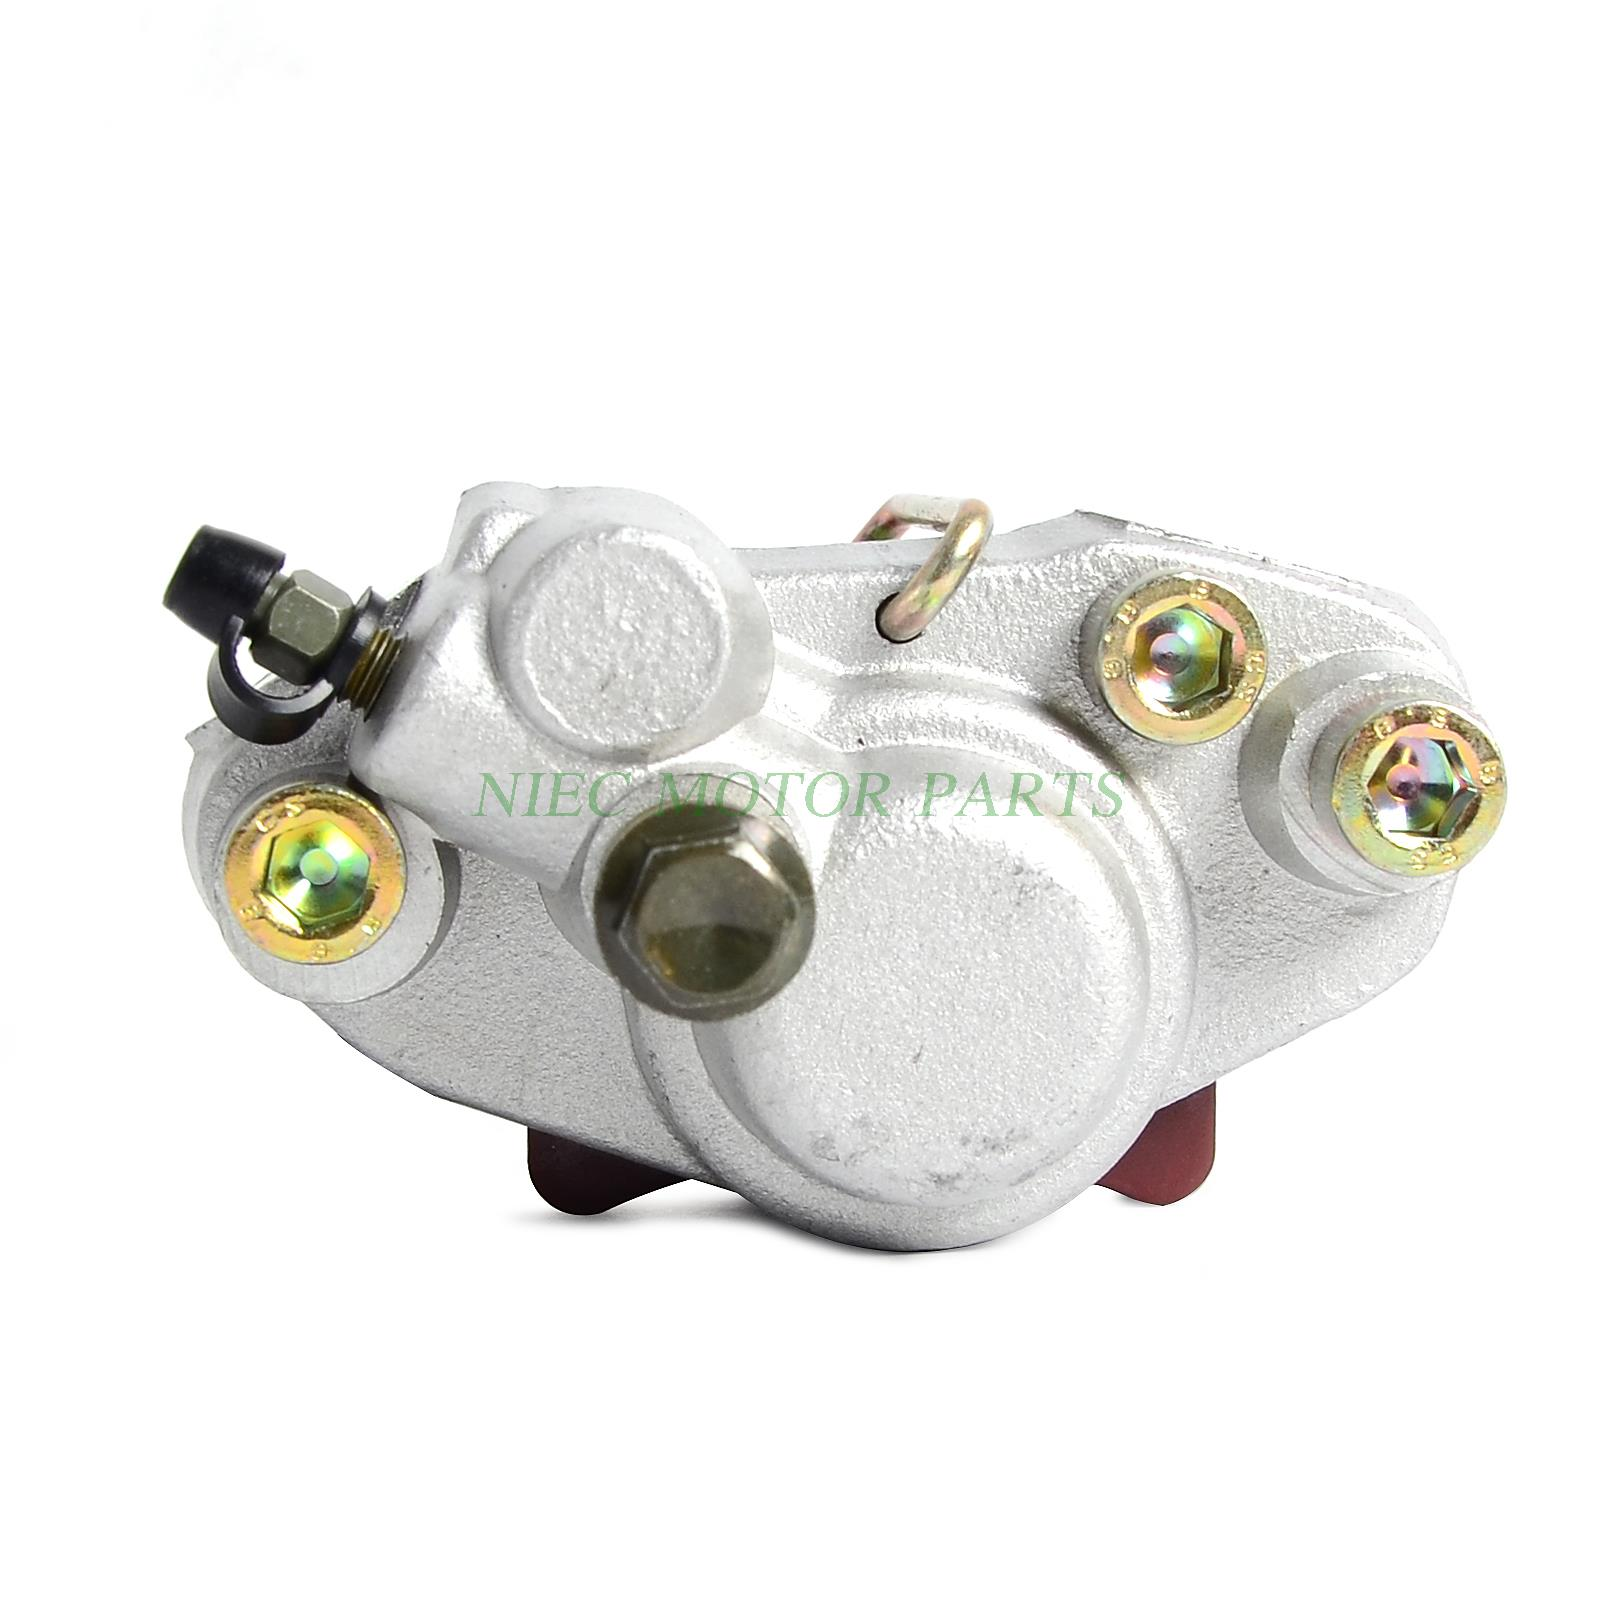 FOR Manco Talon 260 300 ATV Linhai 8260 LH260ATV rear brake caliper with pads crankshaft for 250 257 260 300 yp vog linhai yp250 buyang jinling fa d300 h300 manco talon scooter go kart buggy atv parts